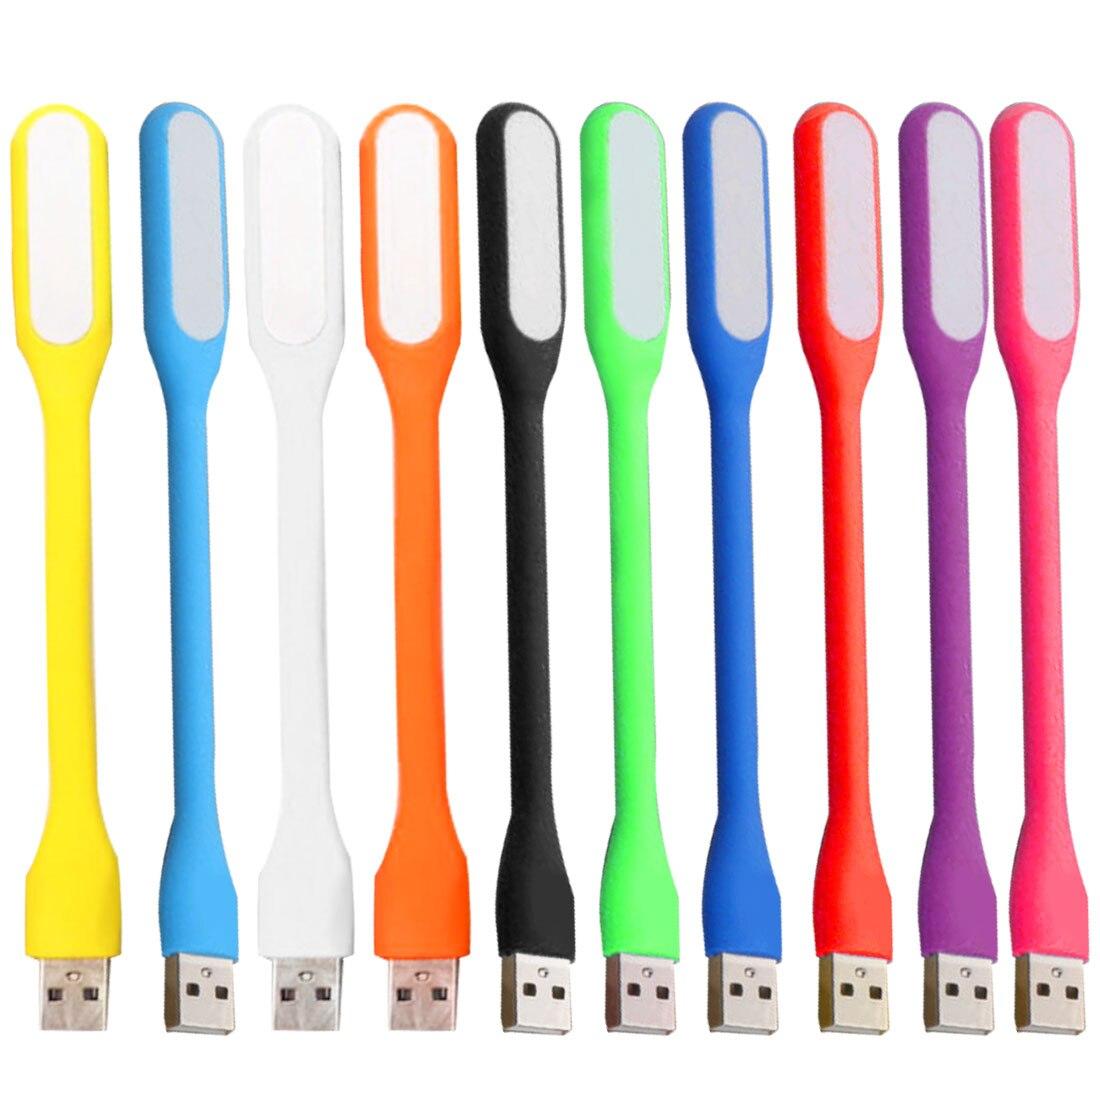 Mini Table Lamp Reading Book Light Gadgets Flexible USB Led Night Lights USB Eye Hand Lamp For Power PC Laptop Notebook